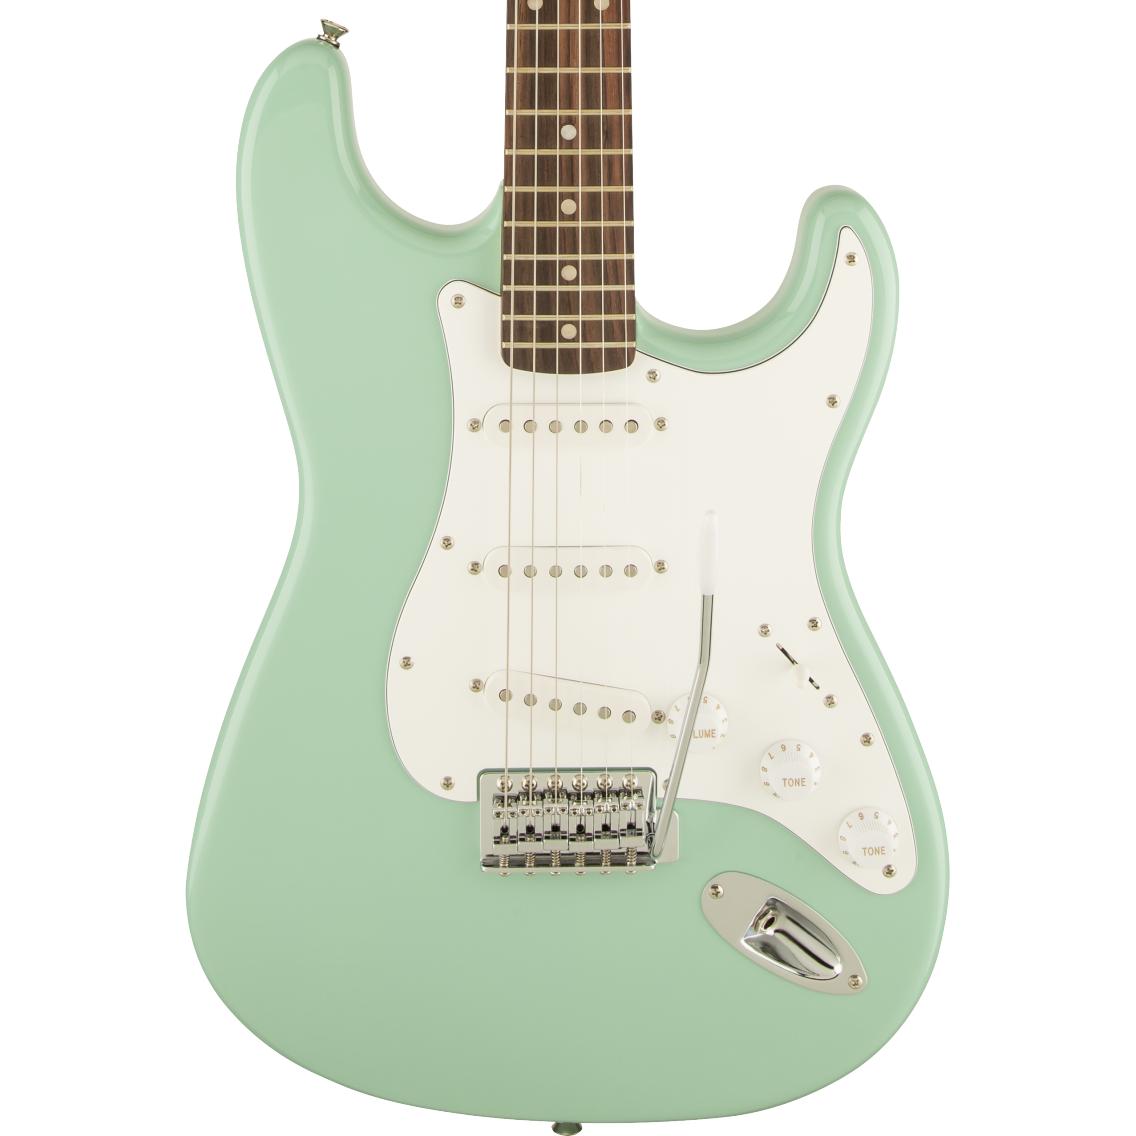 Squier Affinity Series Stratocaster - Laurel Fingerboard, Surf Green